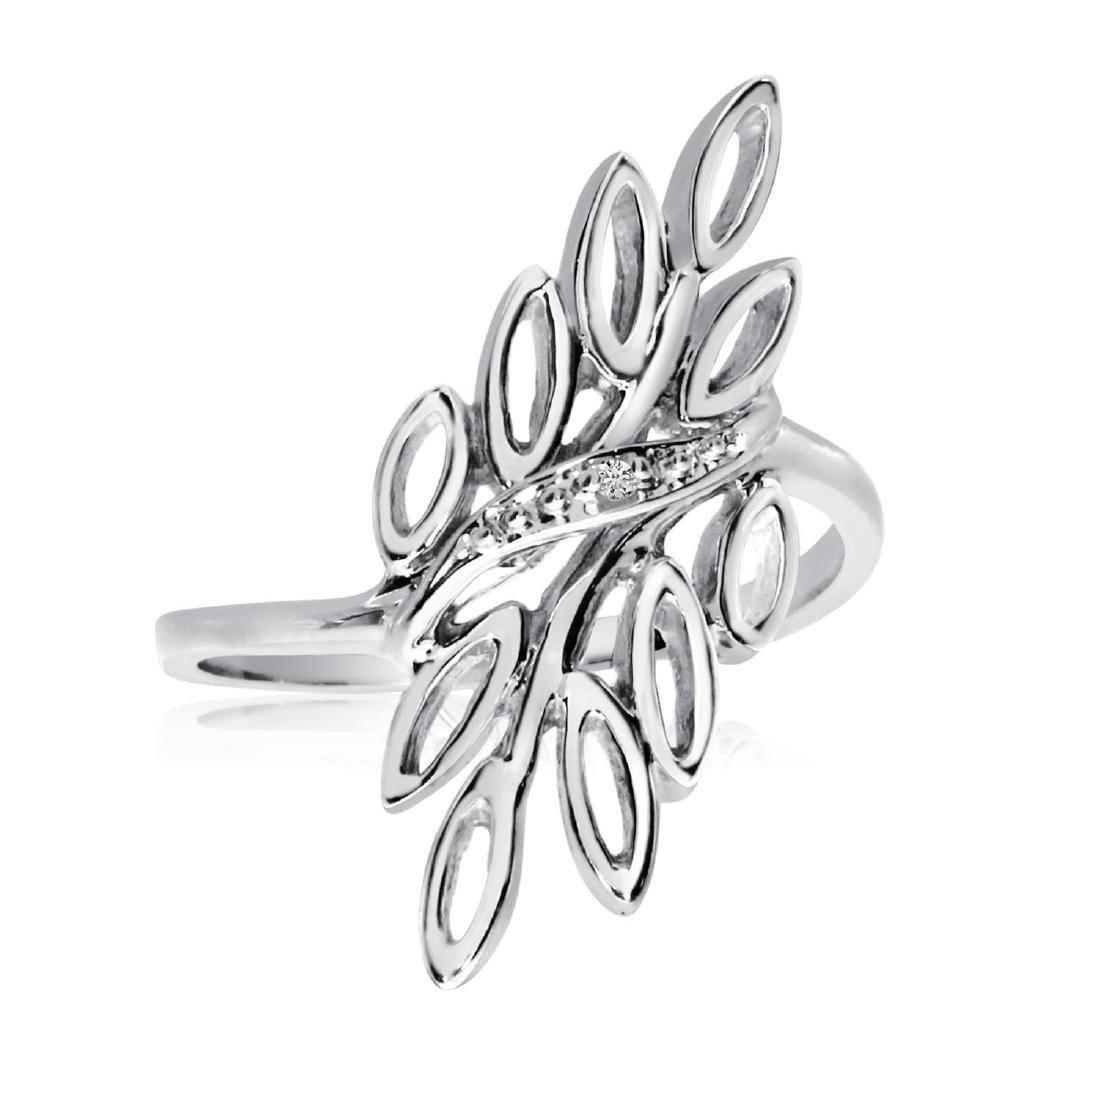 Certified 14K White Gold Diamond Leaf Ring 0.005 CTW